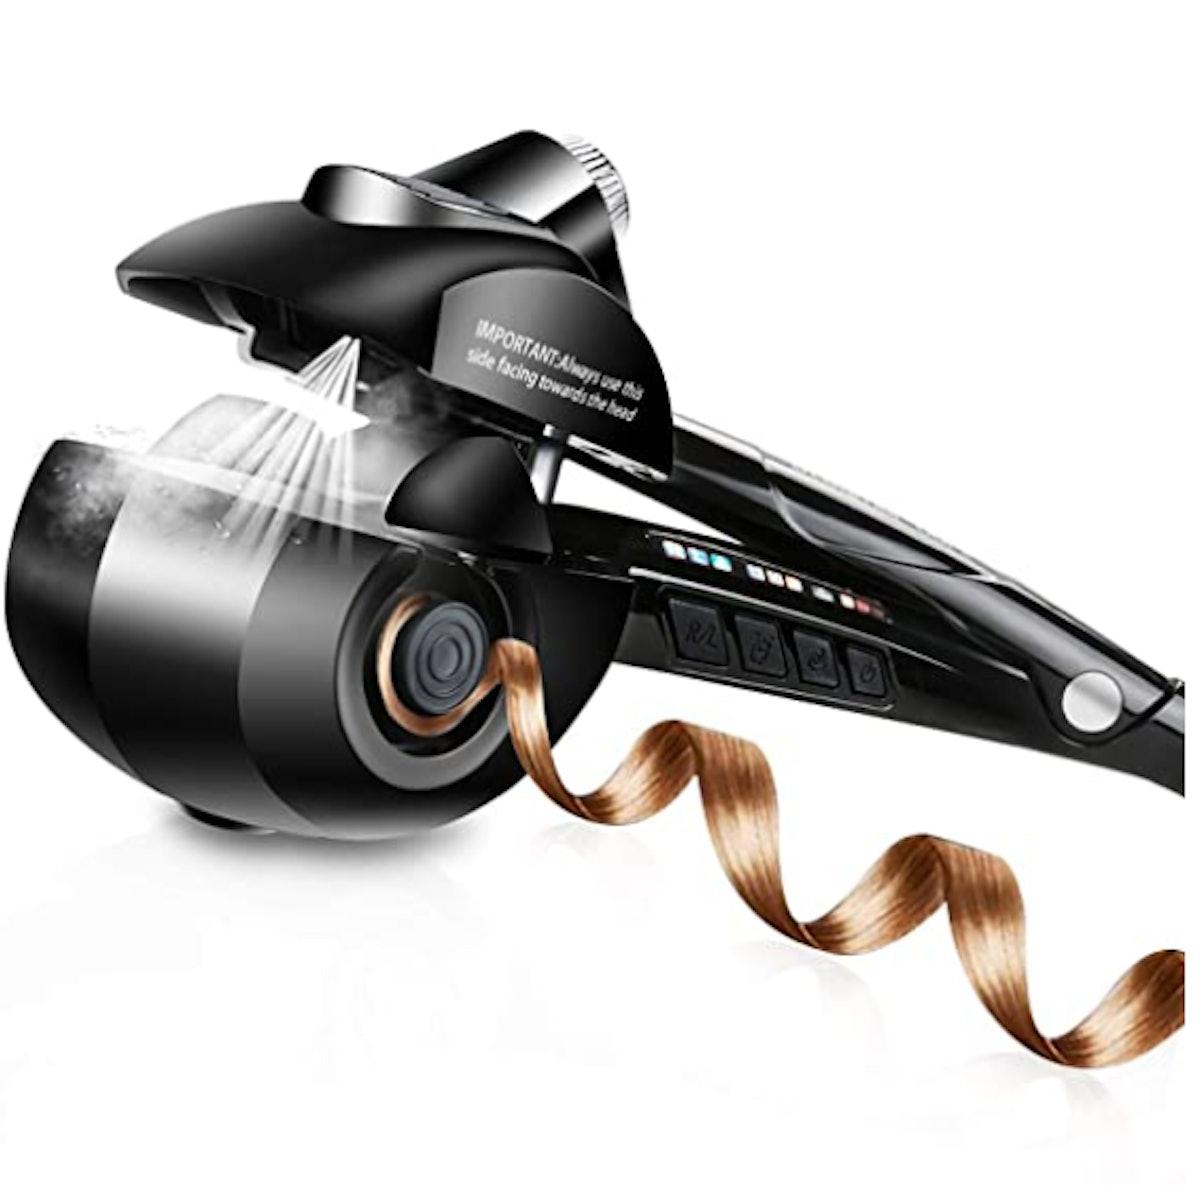 Yitrust Automatic Curling Iron